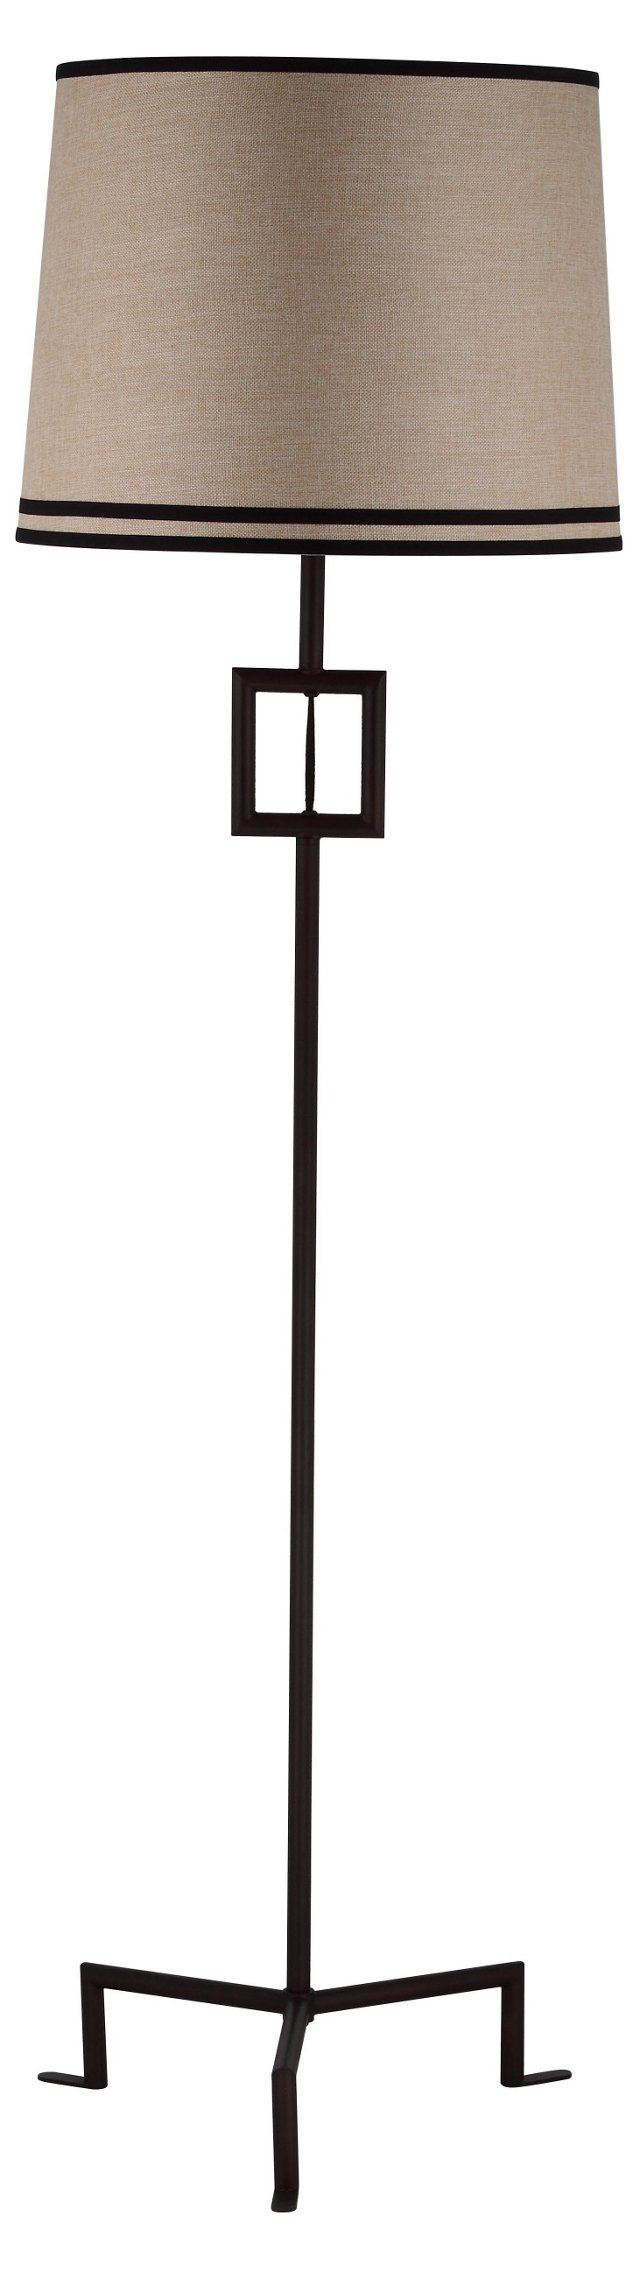 Hanover Floor Lamp, Natural Linen